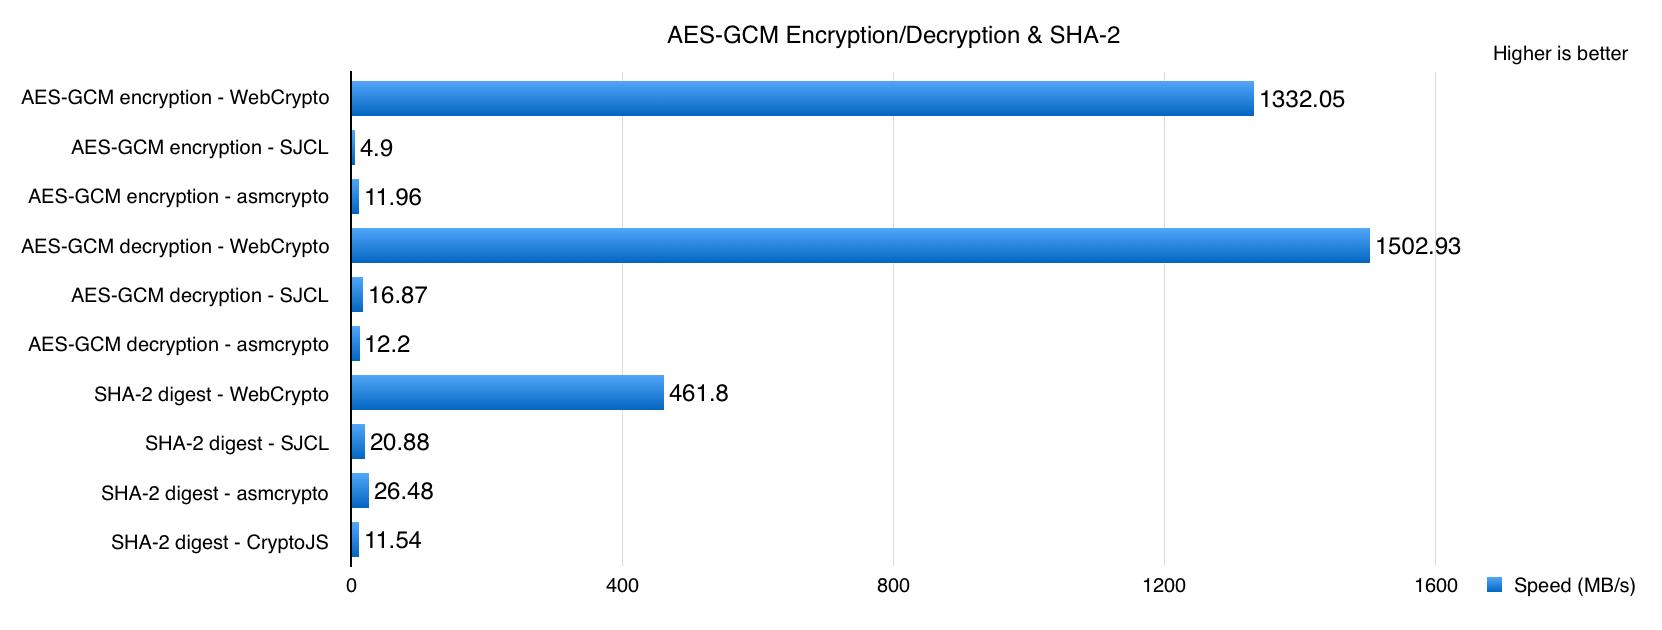 AES-GCM Encryption/Decryption SHA-2